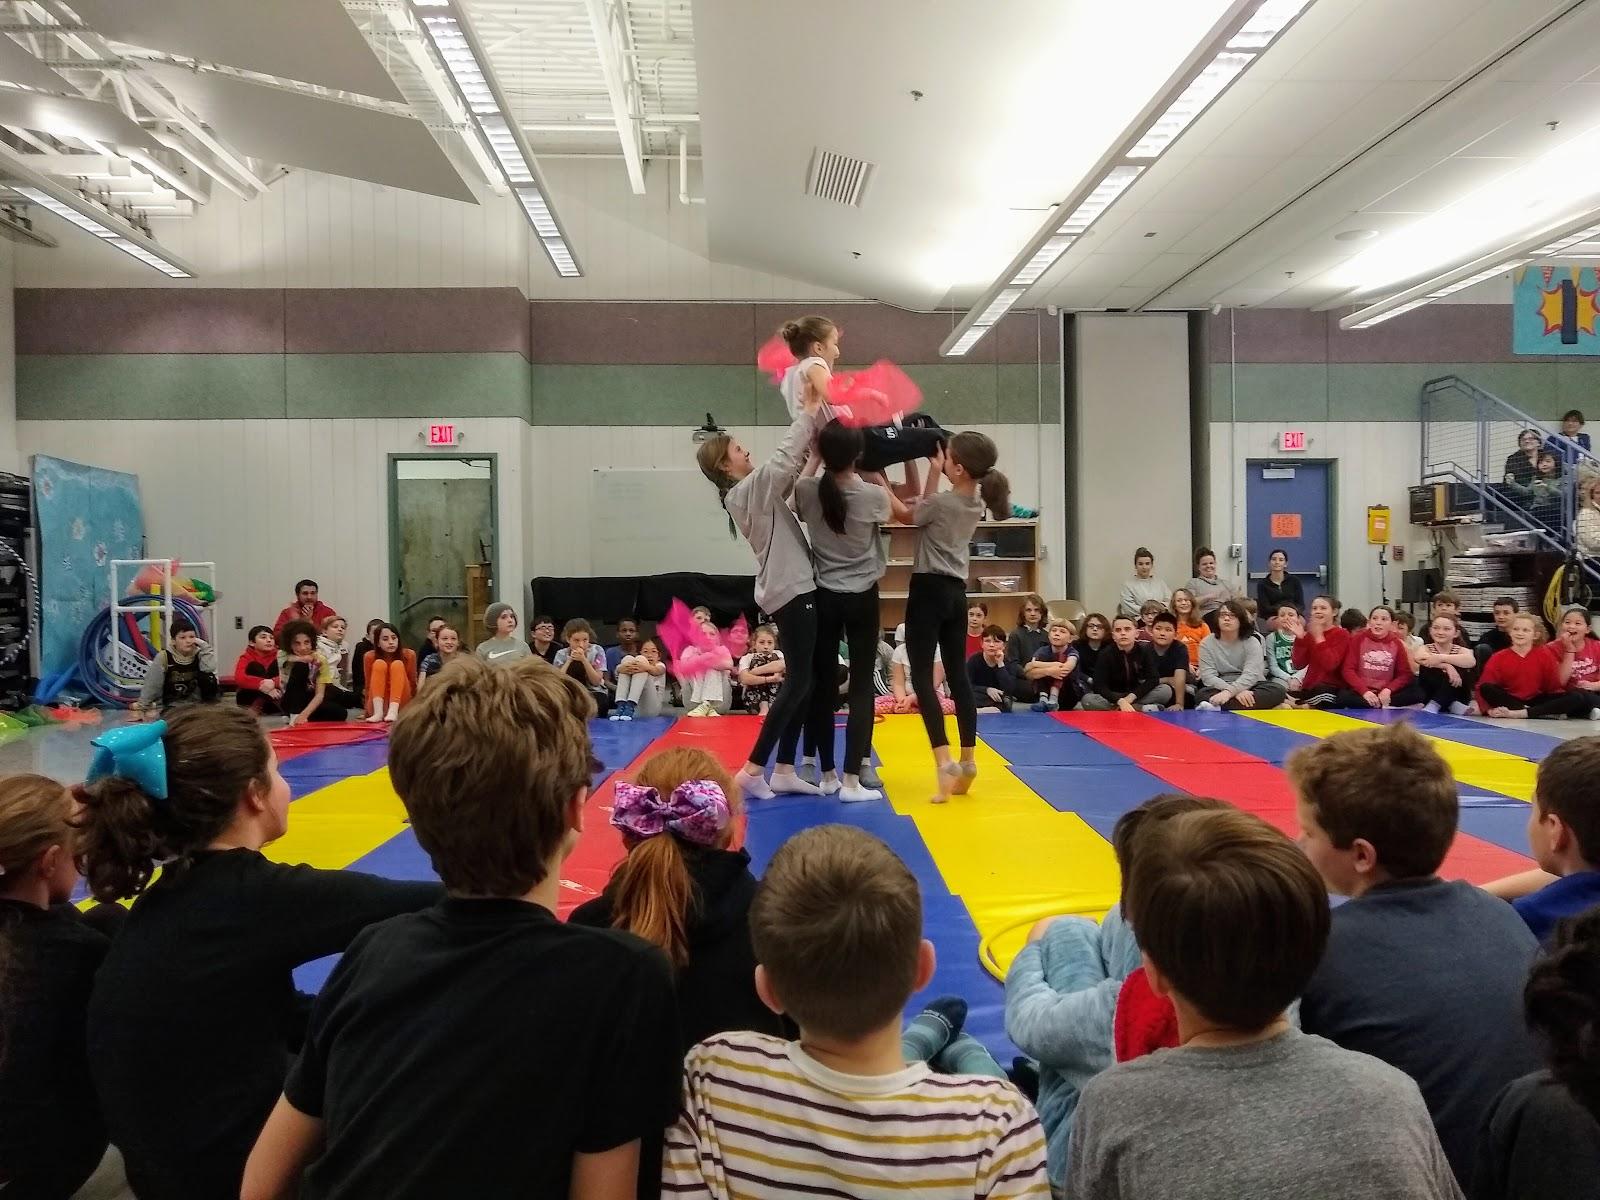 5th grade students tumbling show